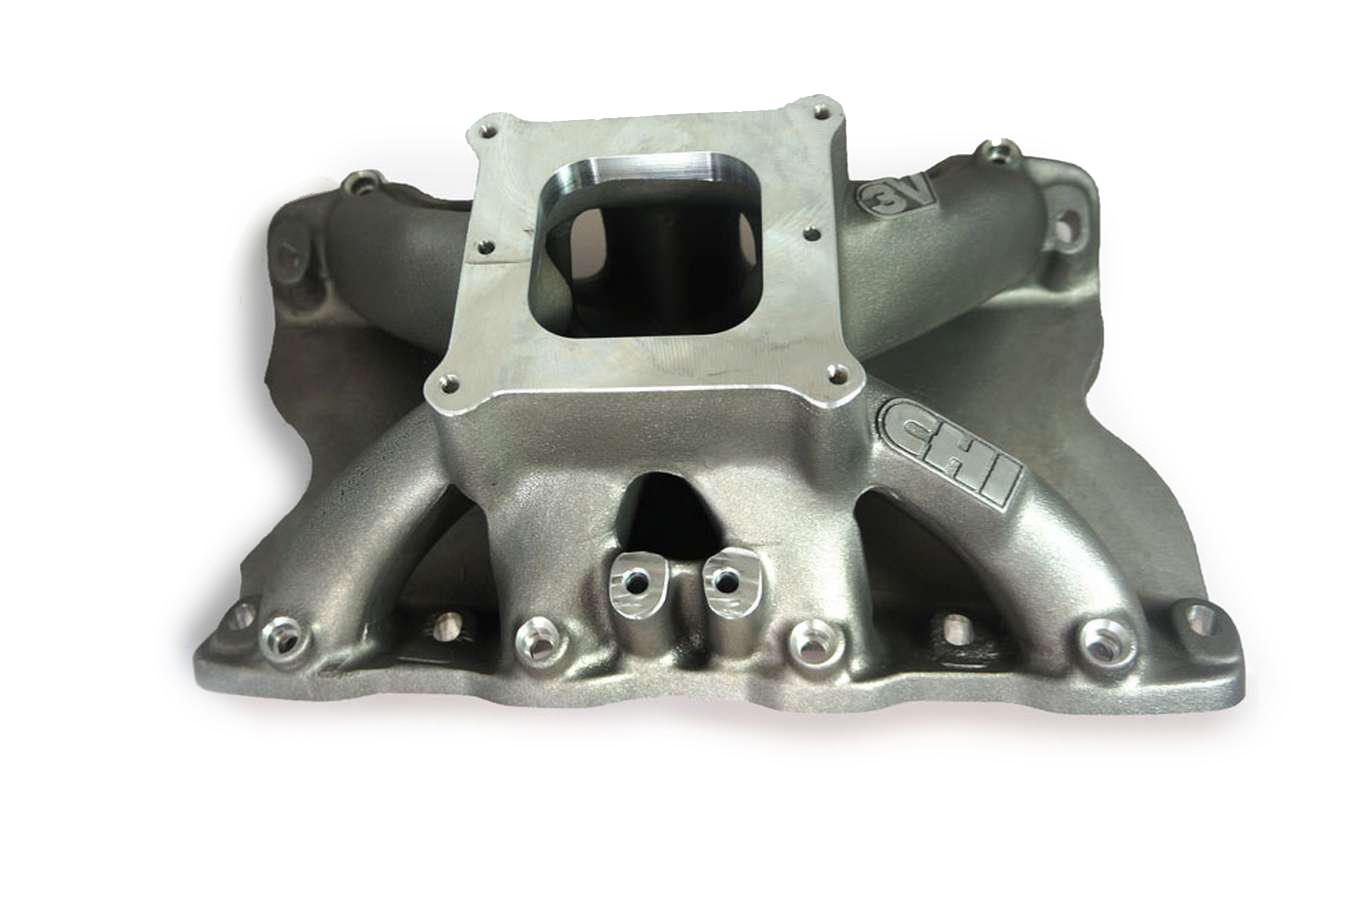 Intake Manifold - 3V 225cc Windsor 9.5